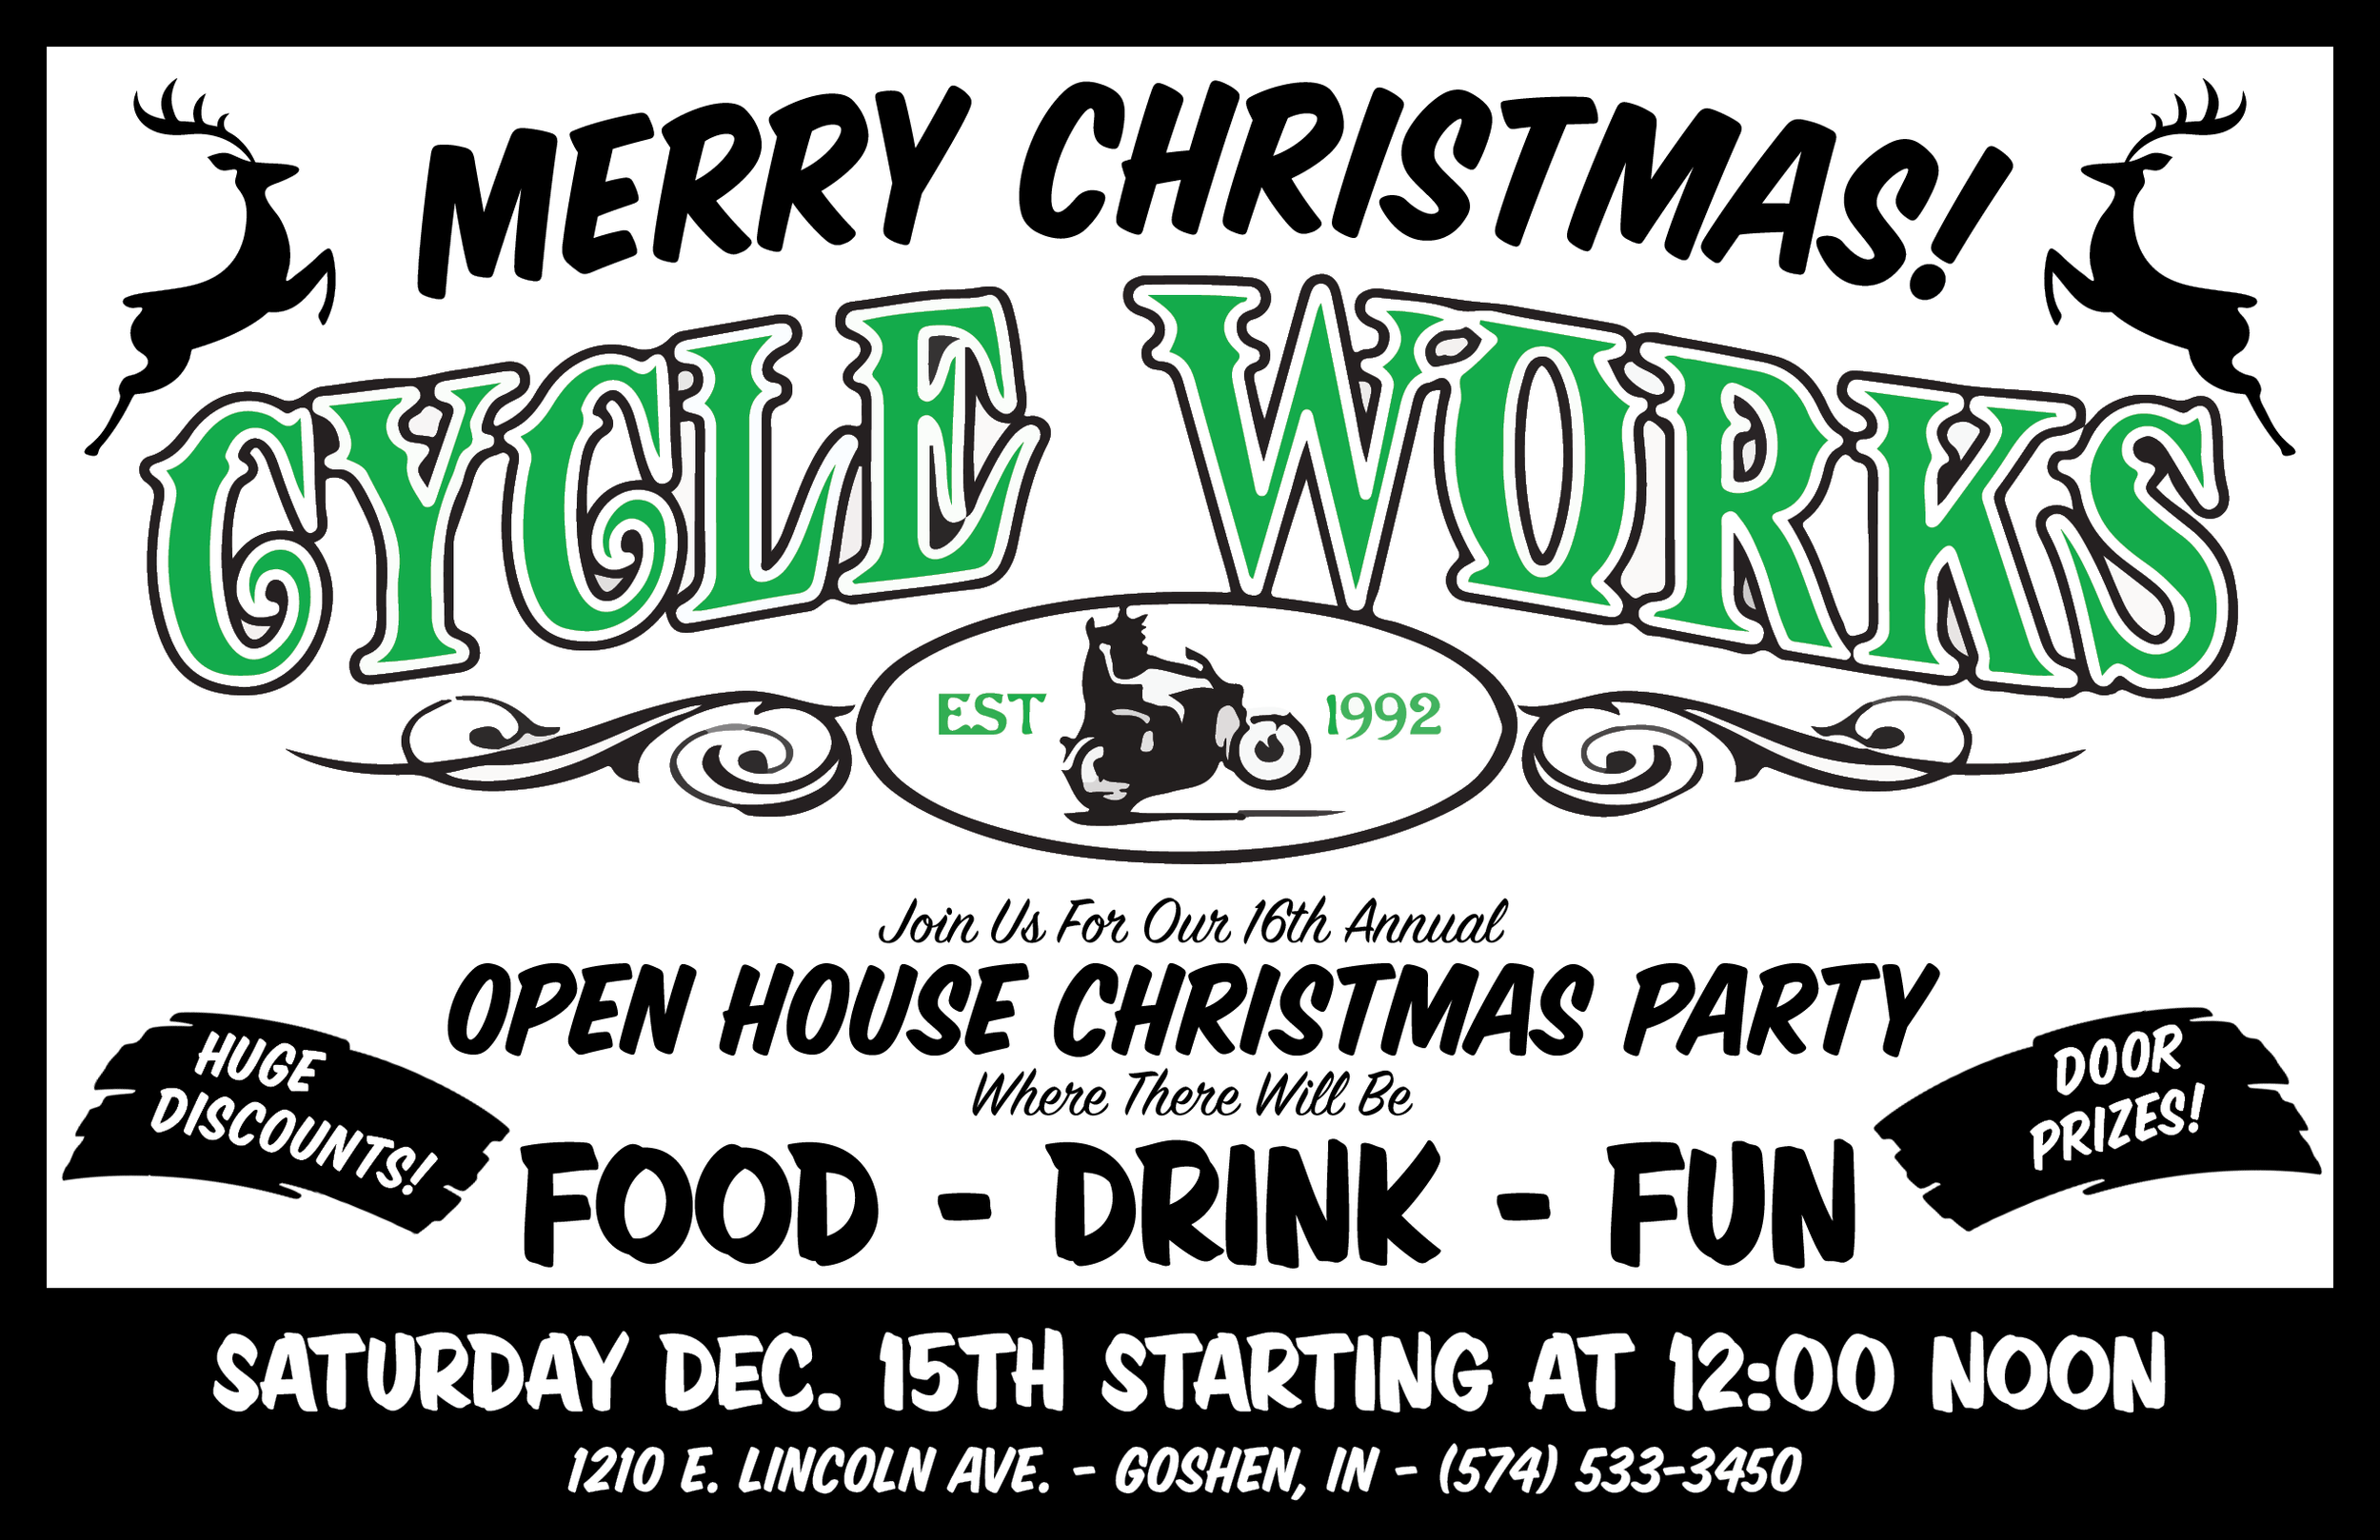 Cycle Works Christmas 2018.png